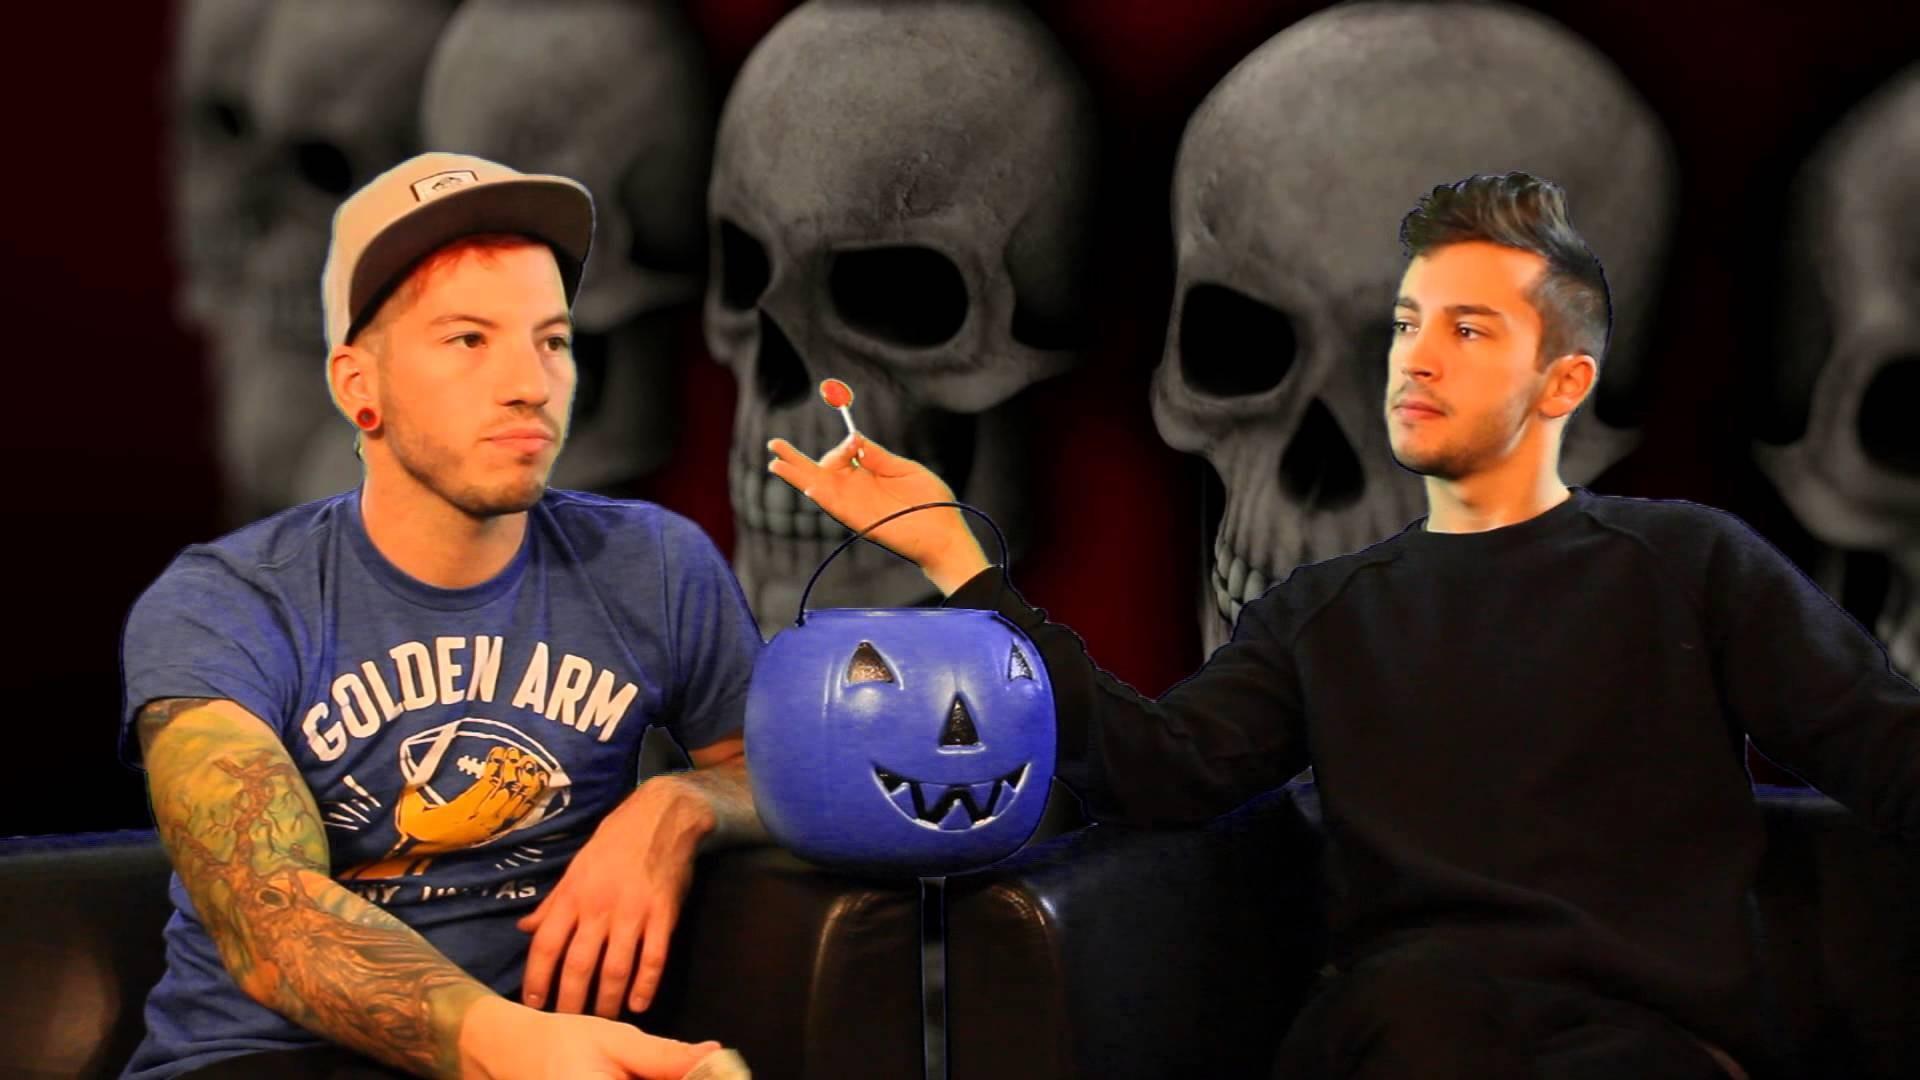 Fall Out Boy Iphone Wallpaper Twenty One Pilots Desktop Wallpaper 183 ① Download Free